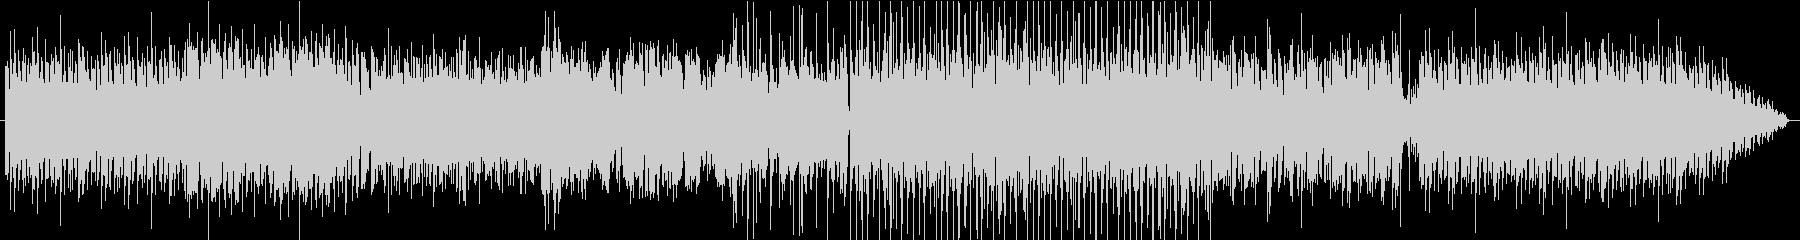 EDMのBGMの未再生の波形